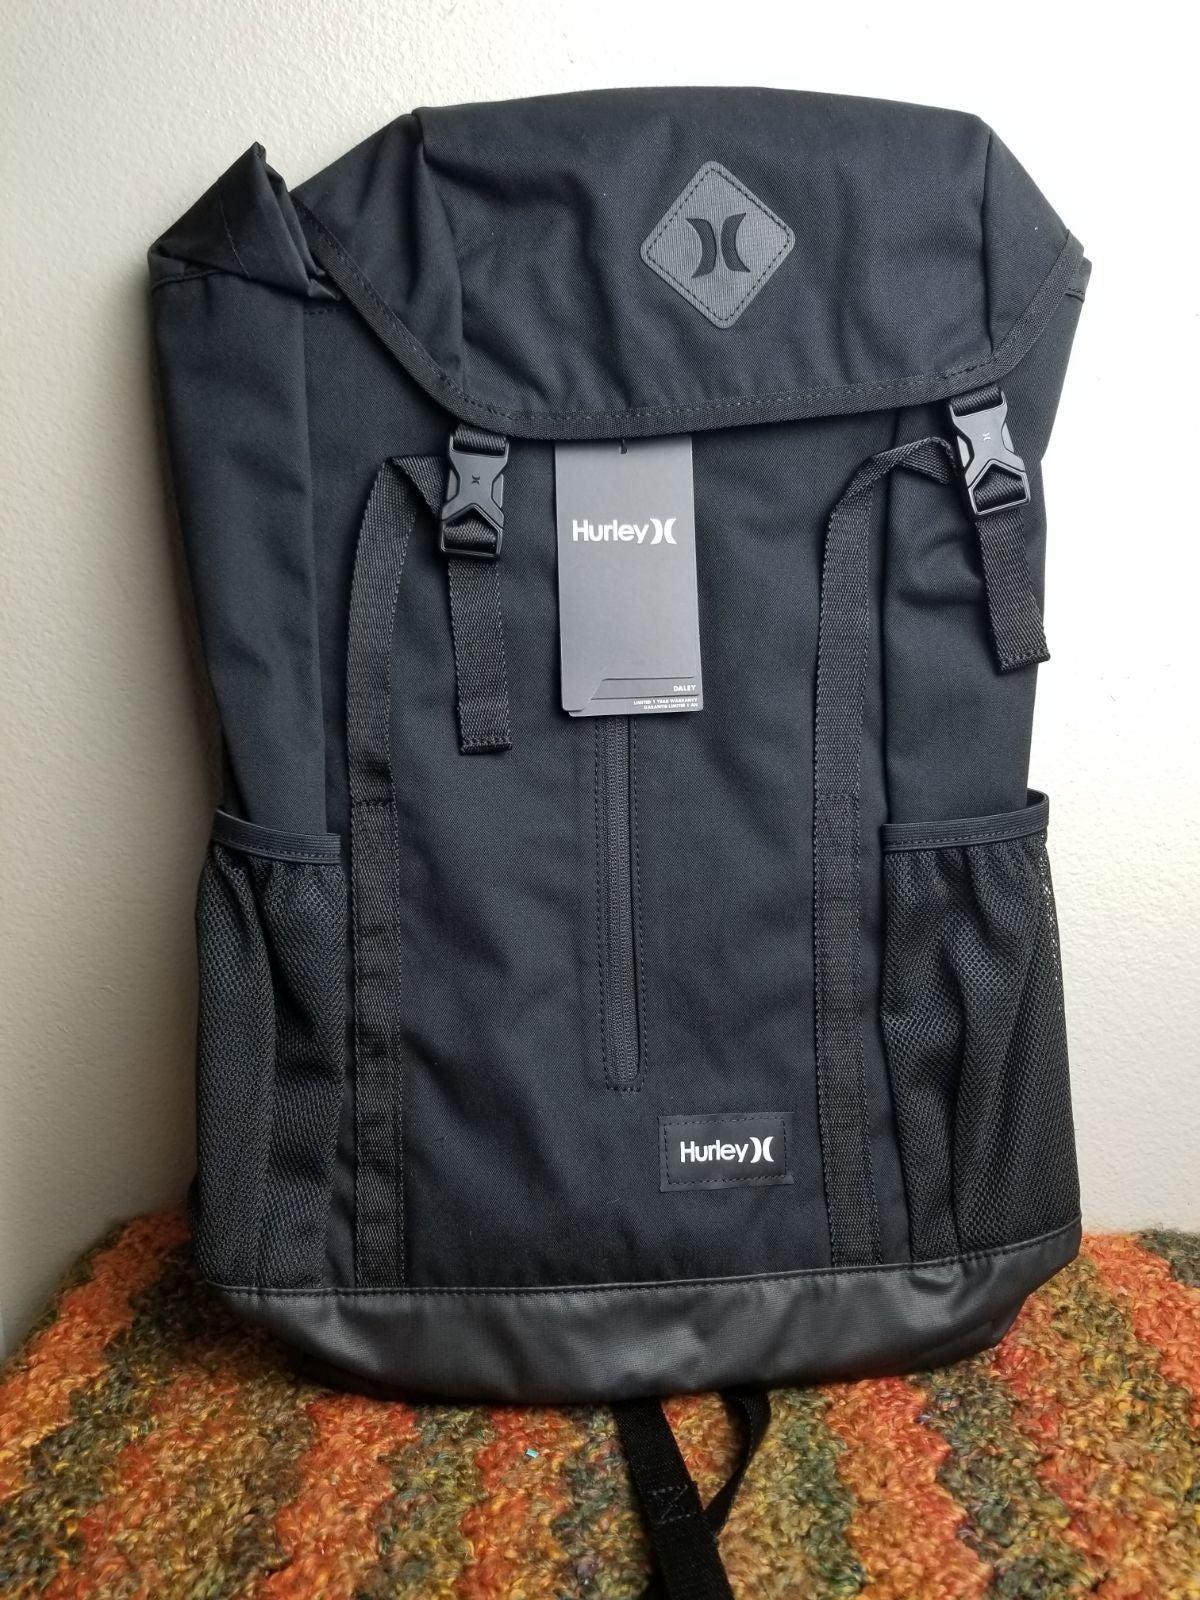 Hurley Daley Black Drawstring Backpack